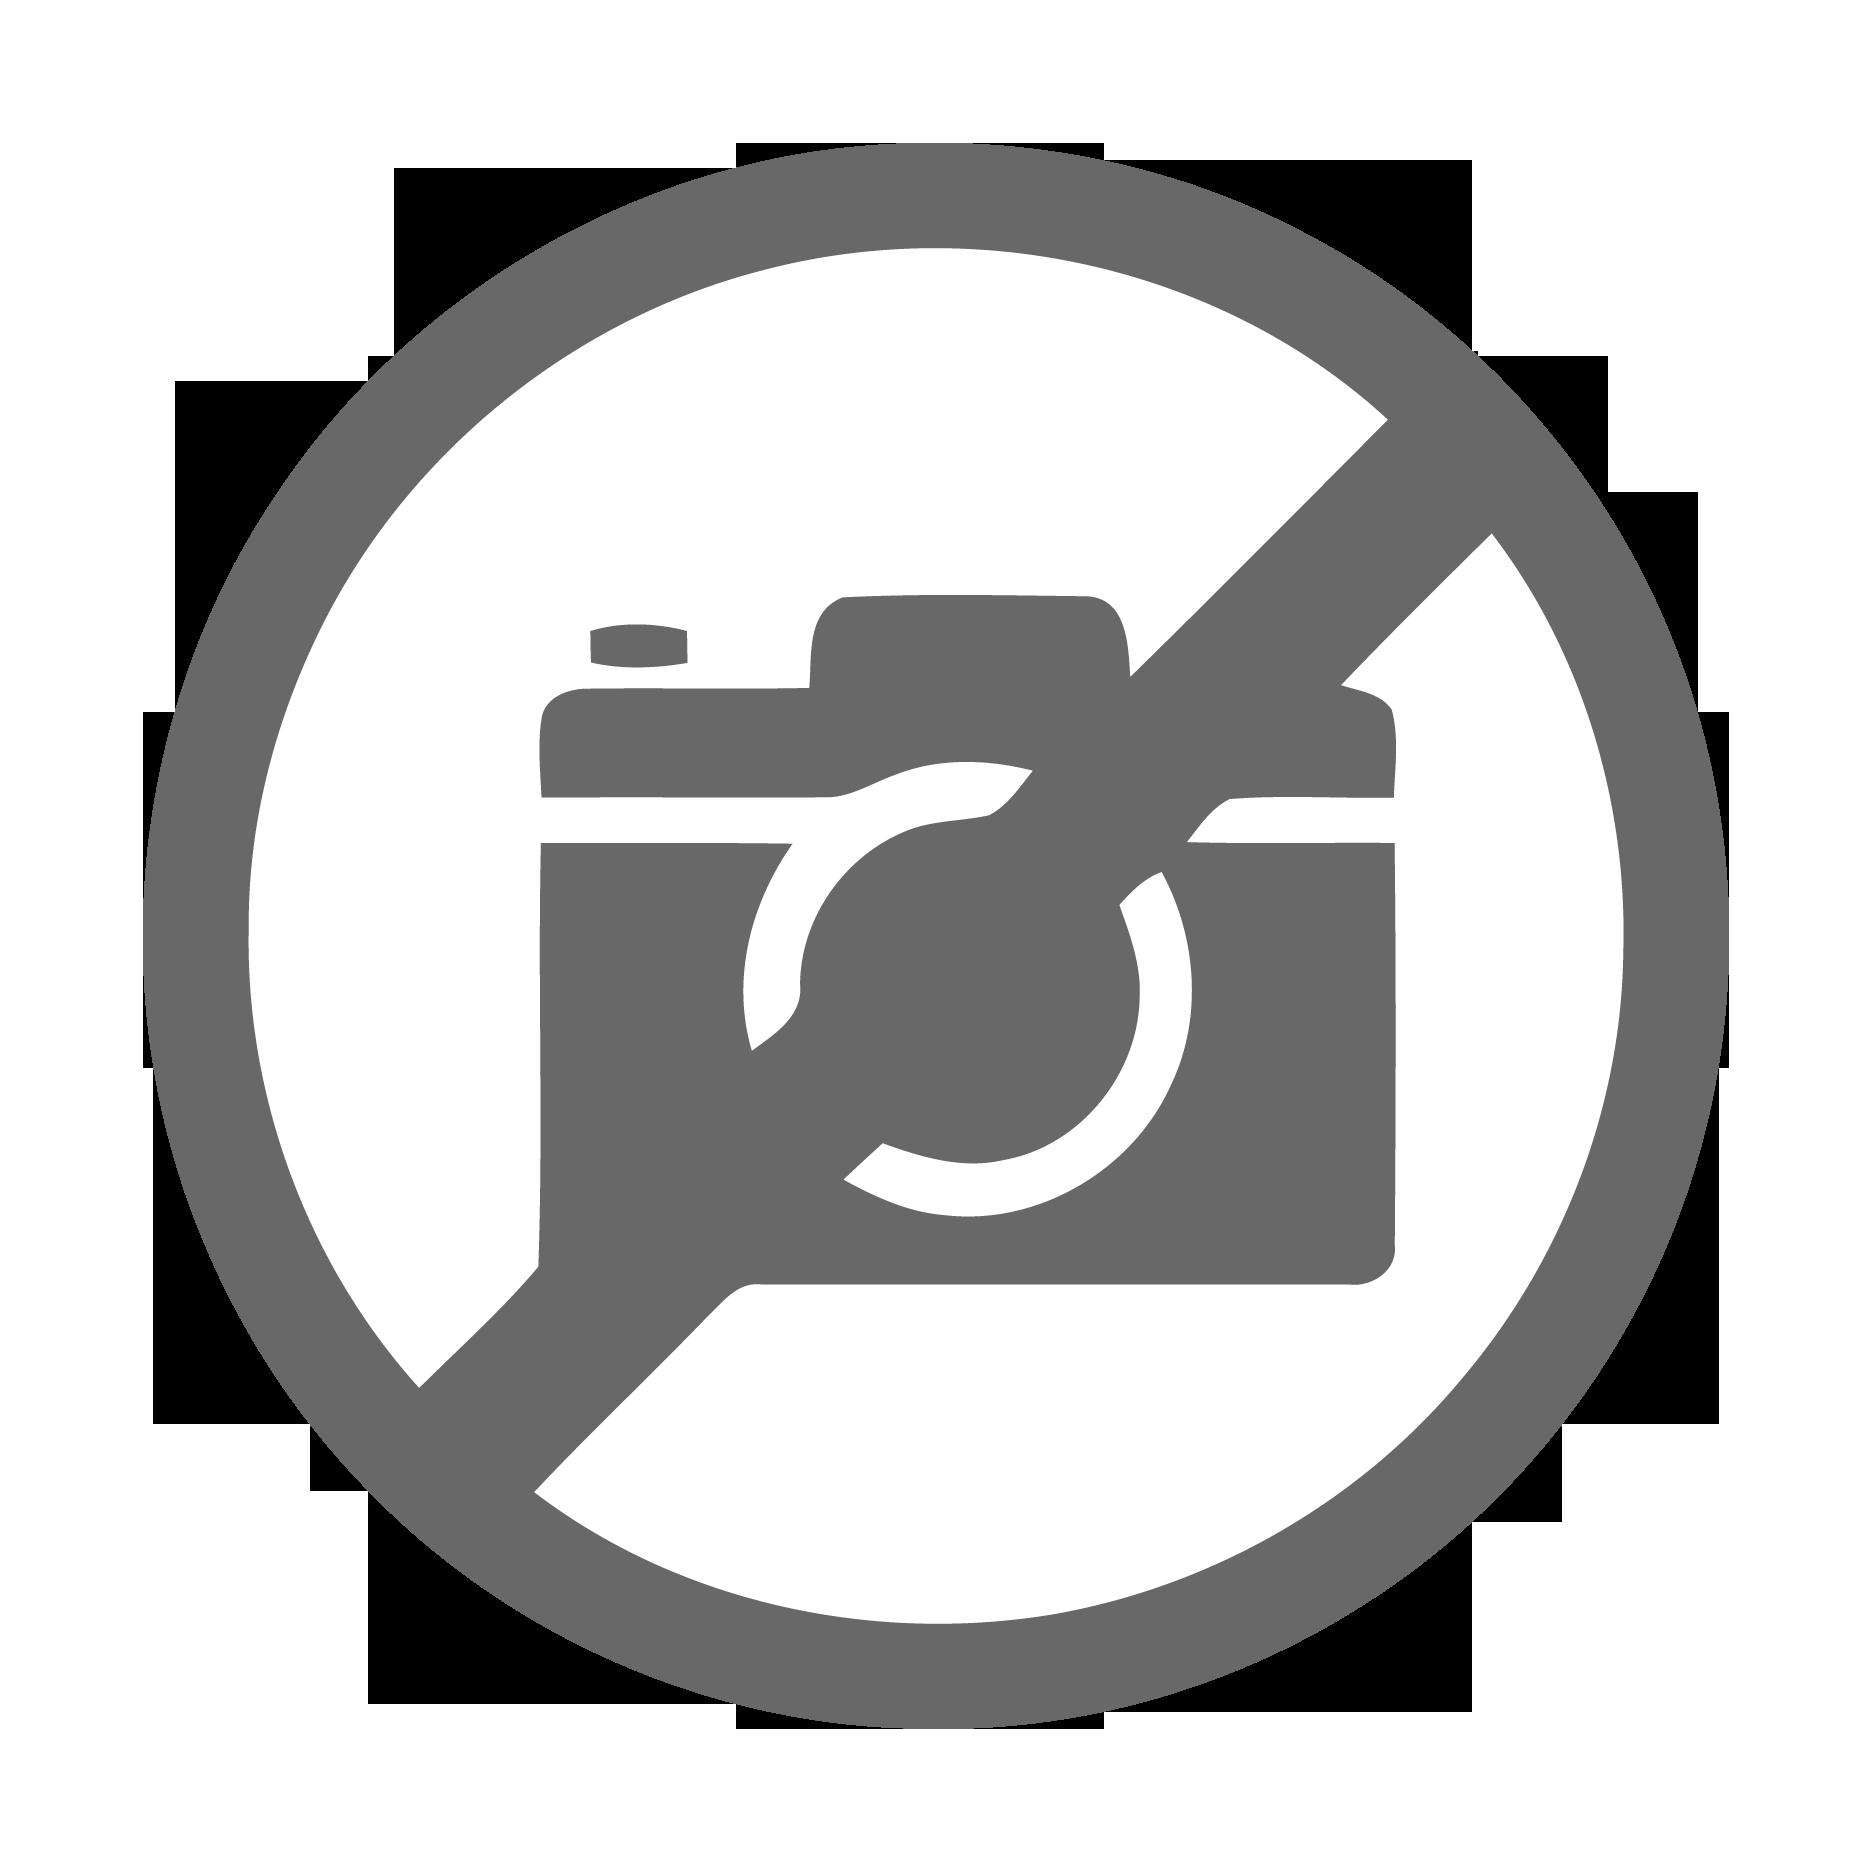 Nay golemite Palachinki